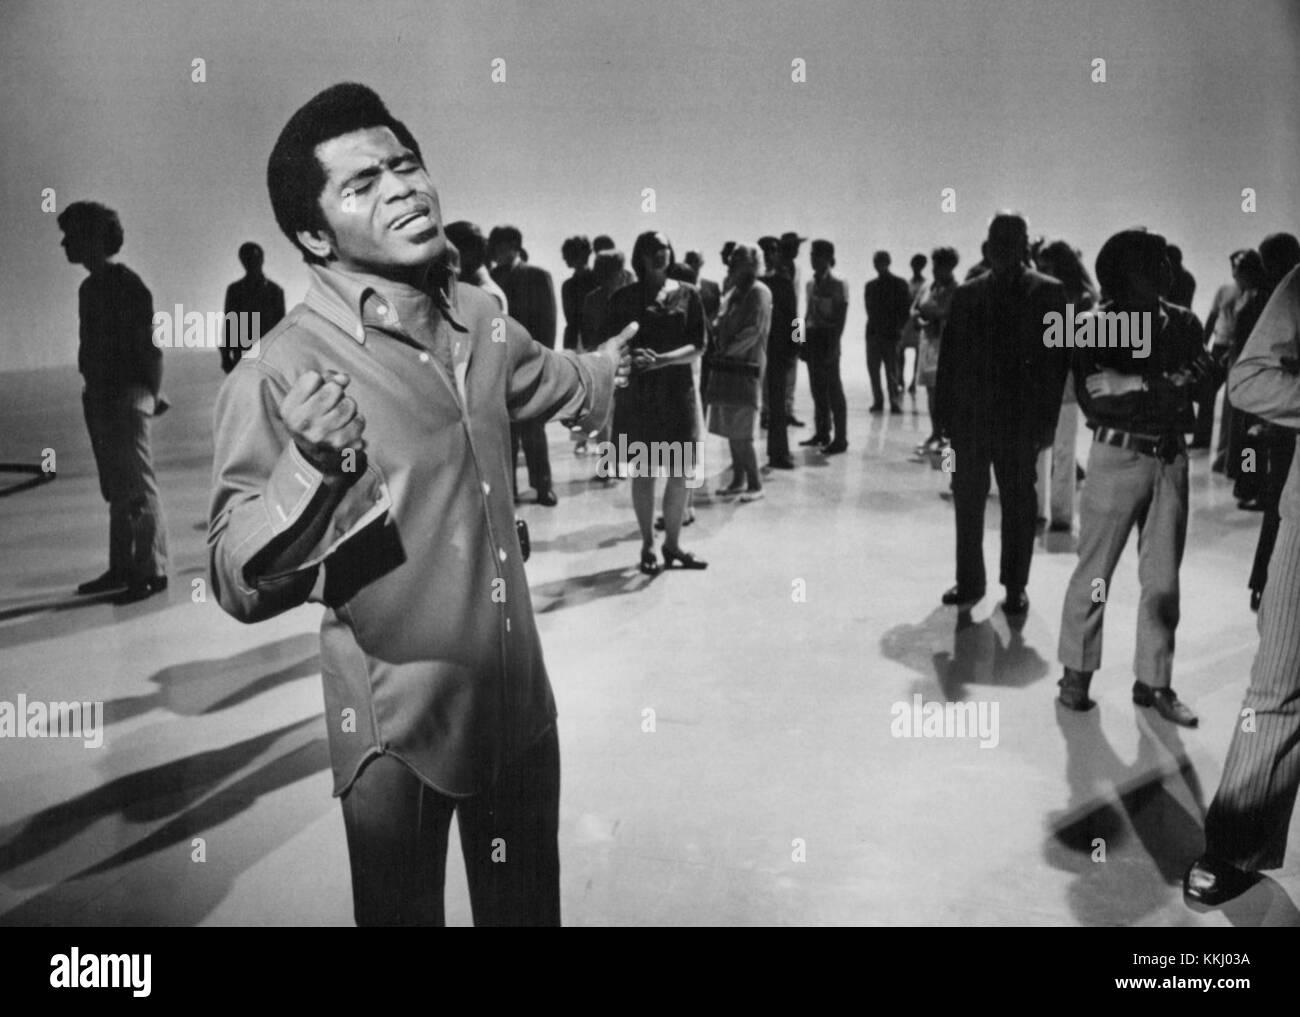 James Brown Music Scene 1969 Stock Photo